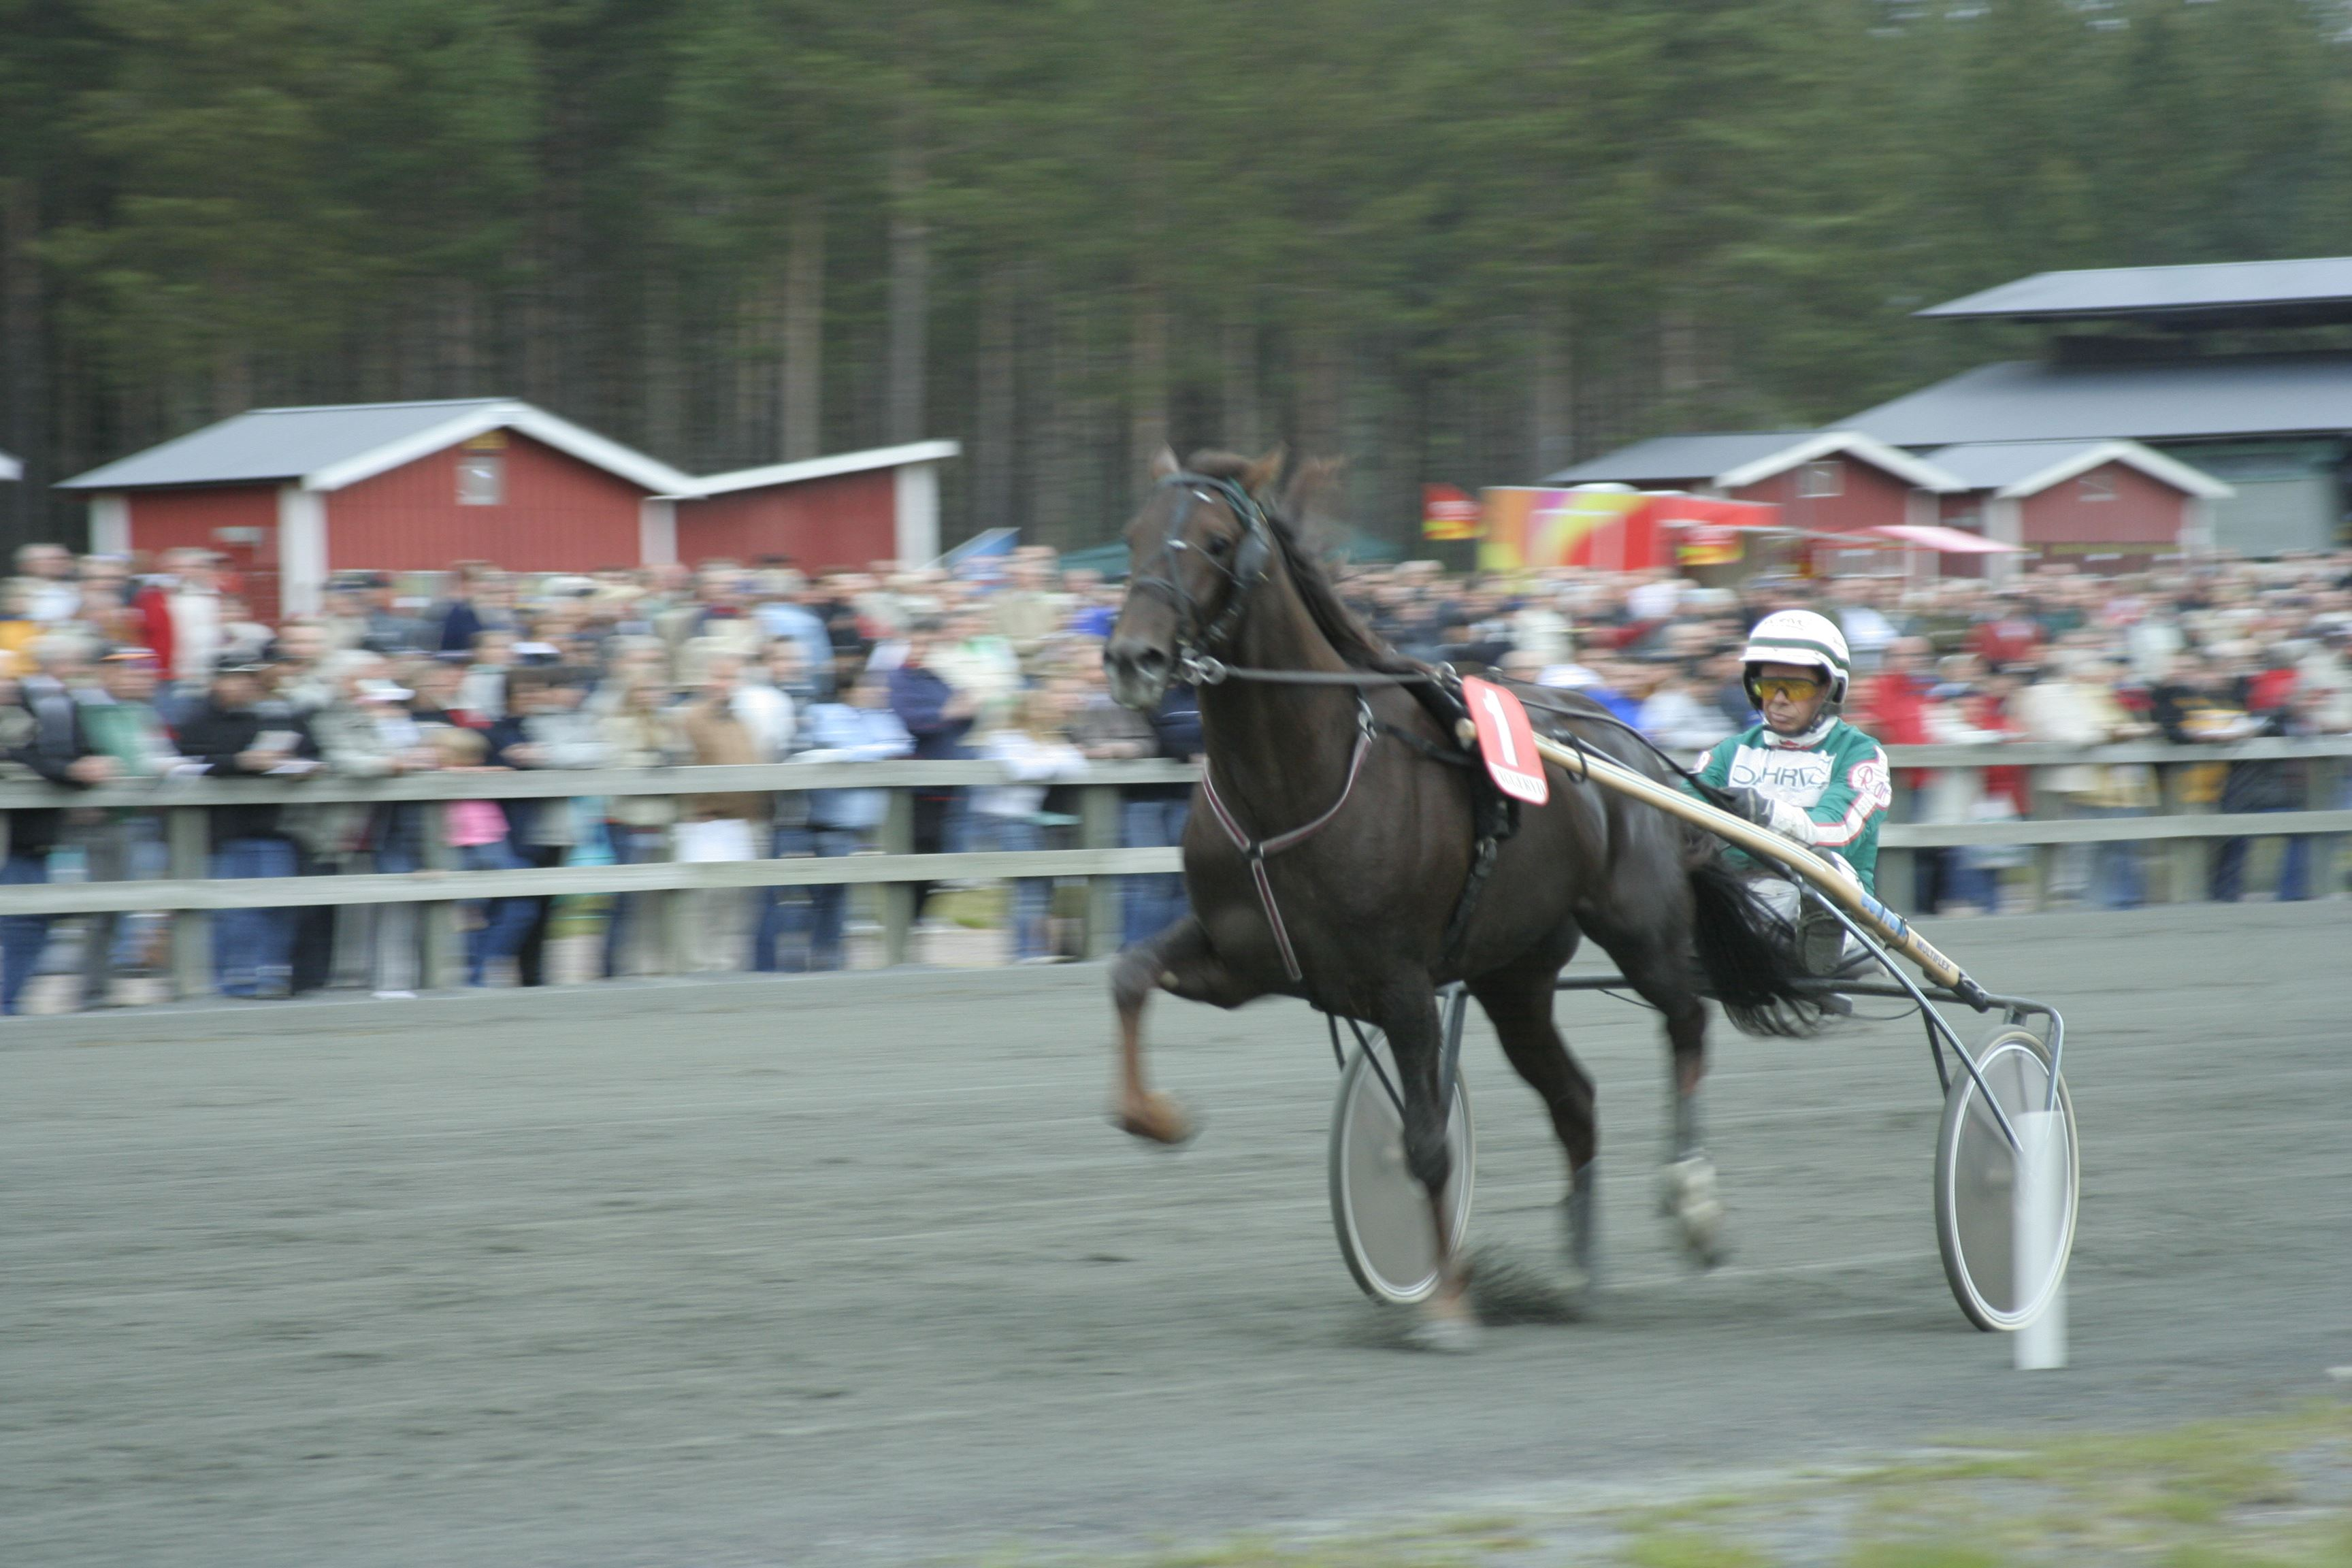 Mattias Bokinge, Travtävlingar, Vaggeryds travet